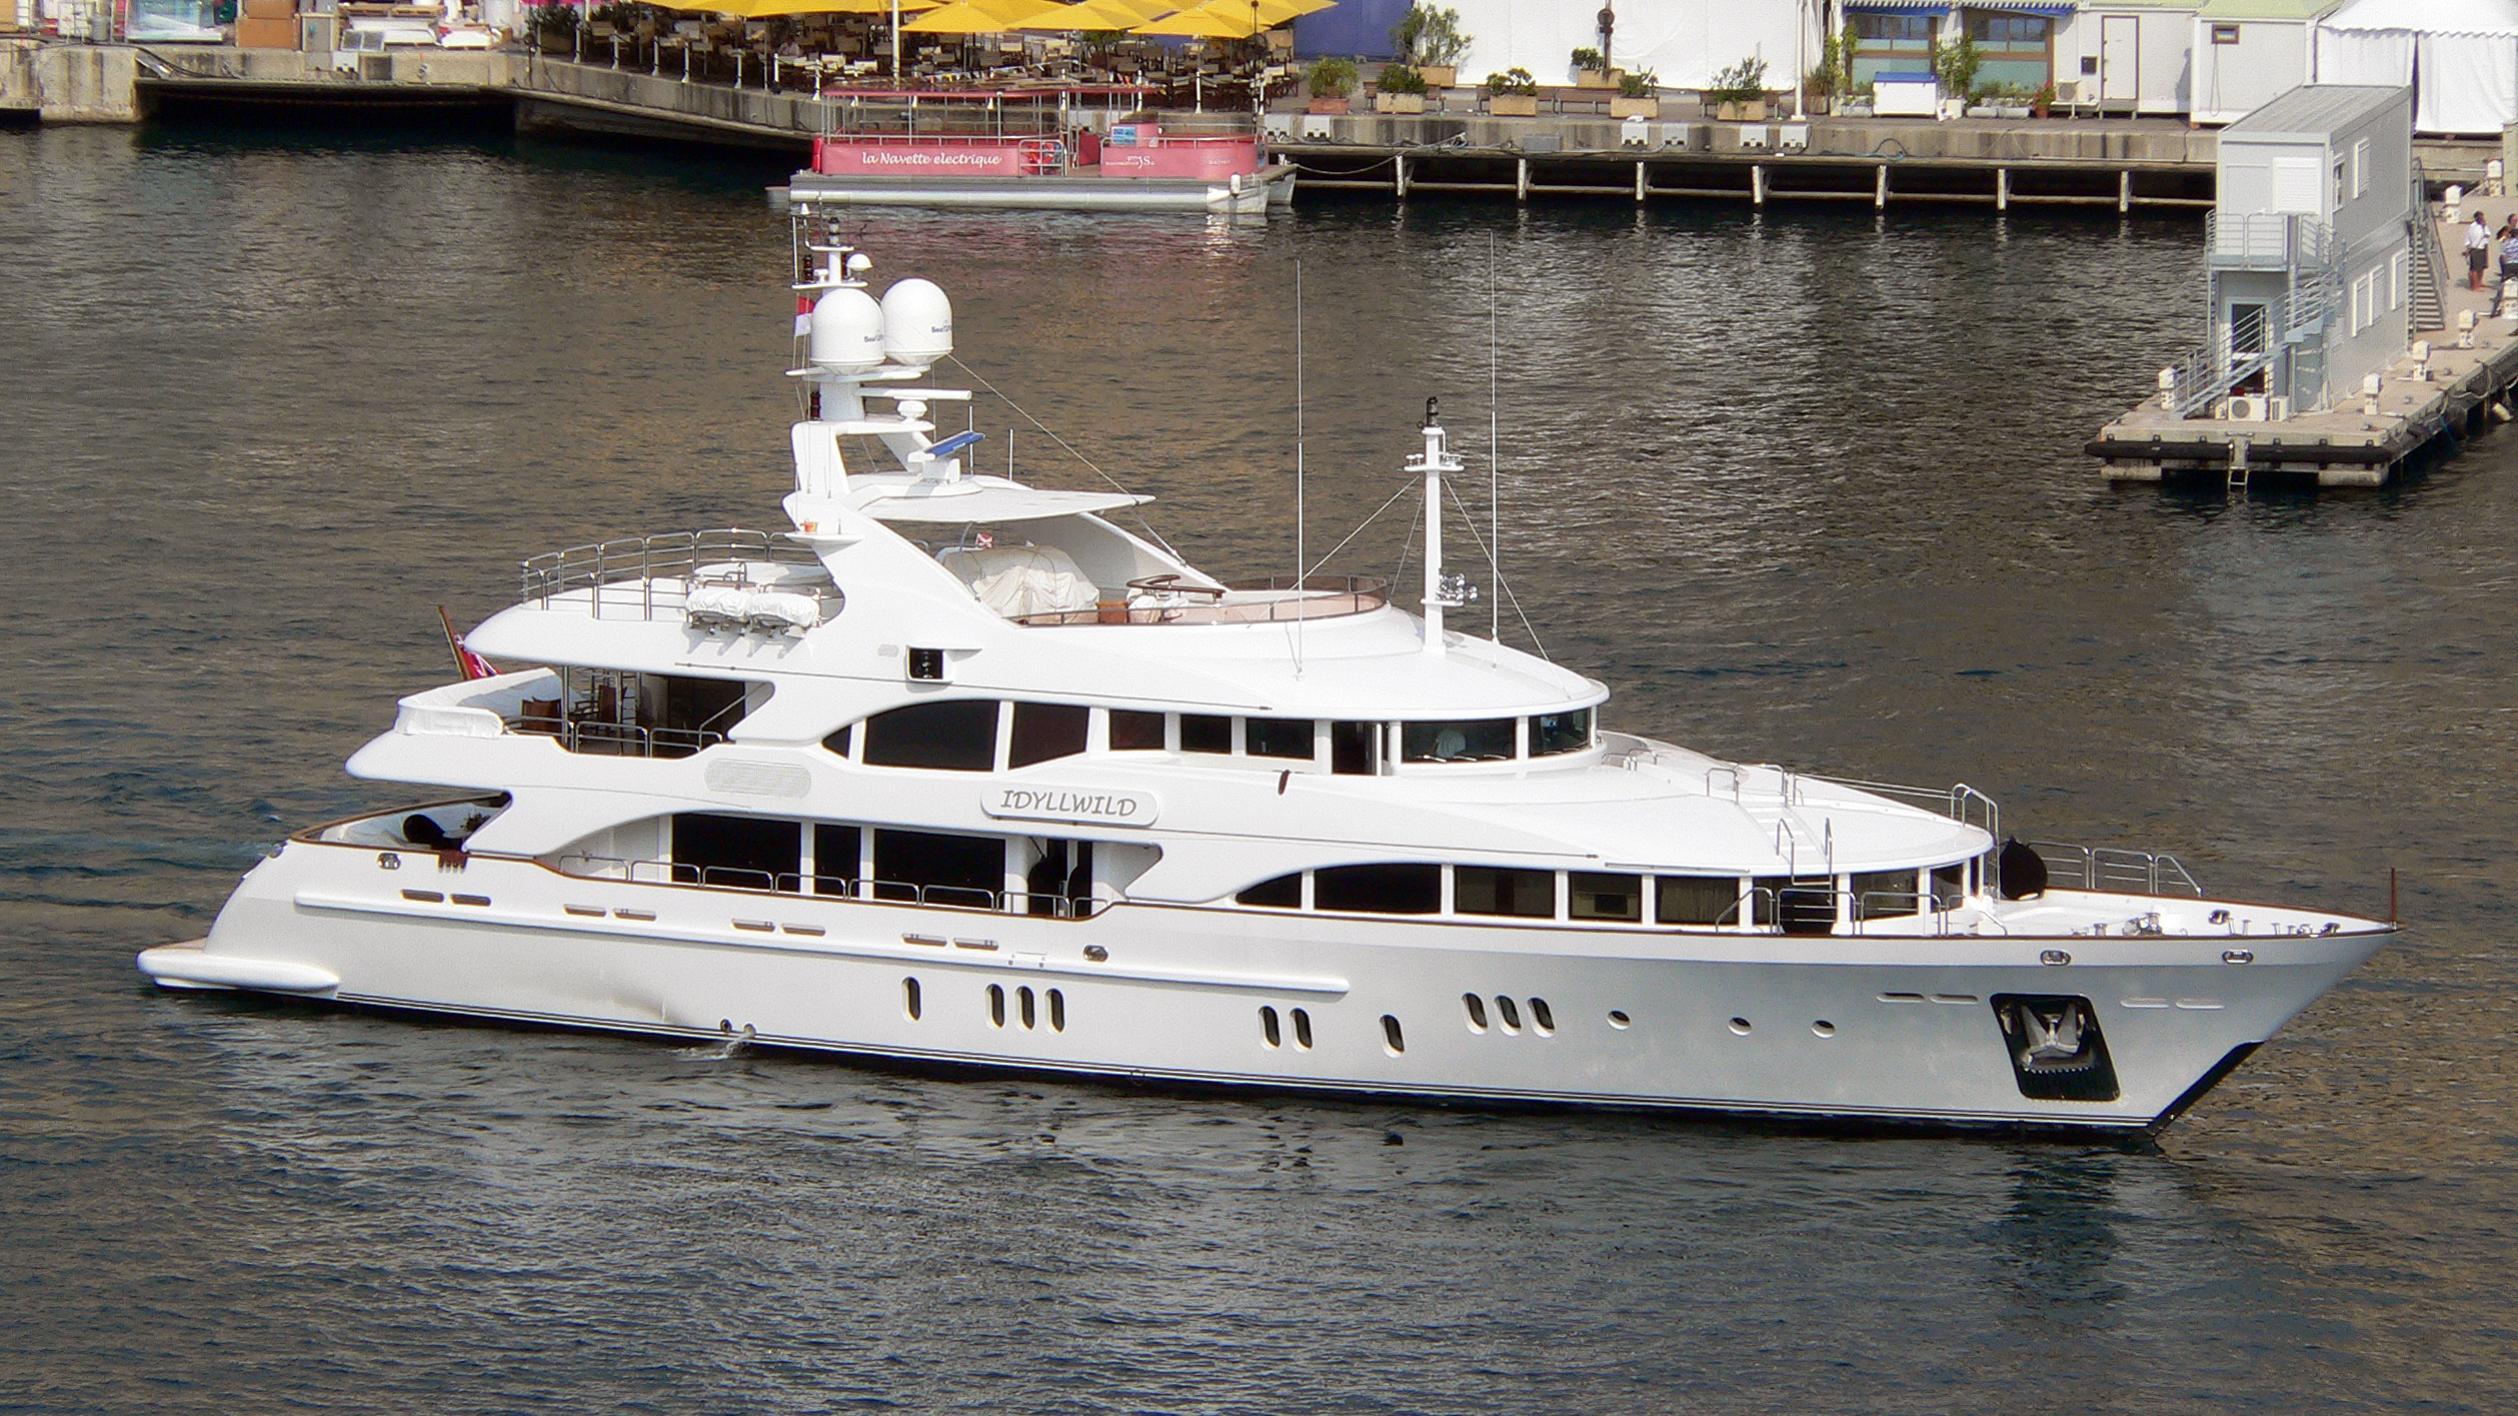 idyllwild-motor-yacht-benetti-vision-2005-44m-running-profile